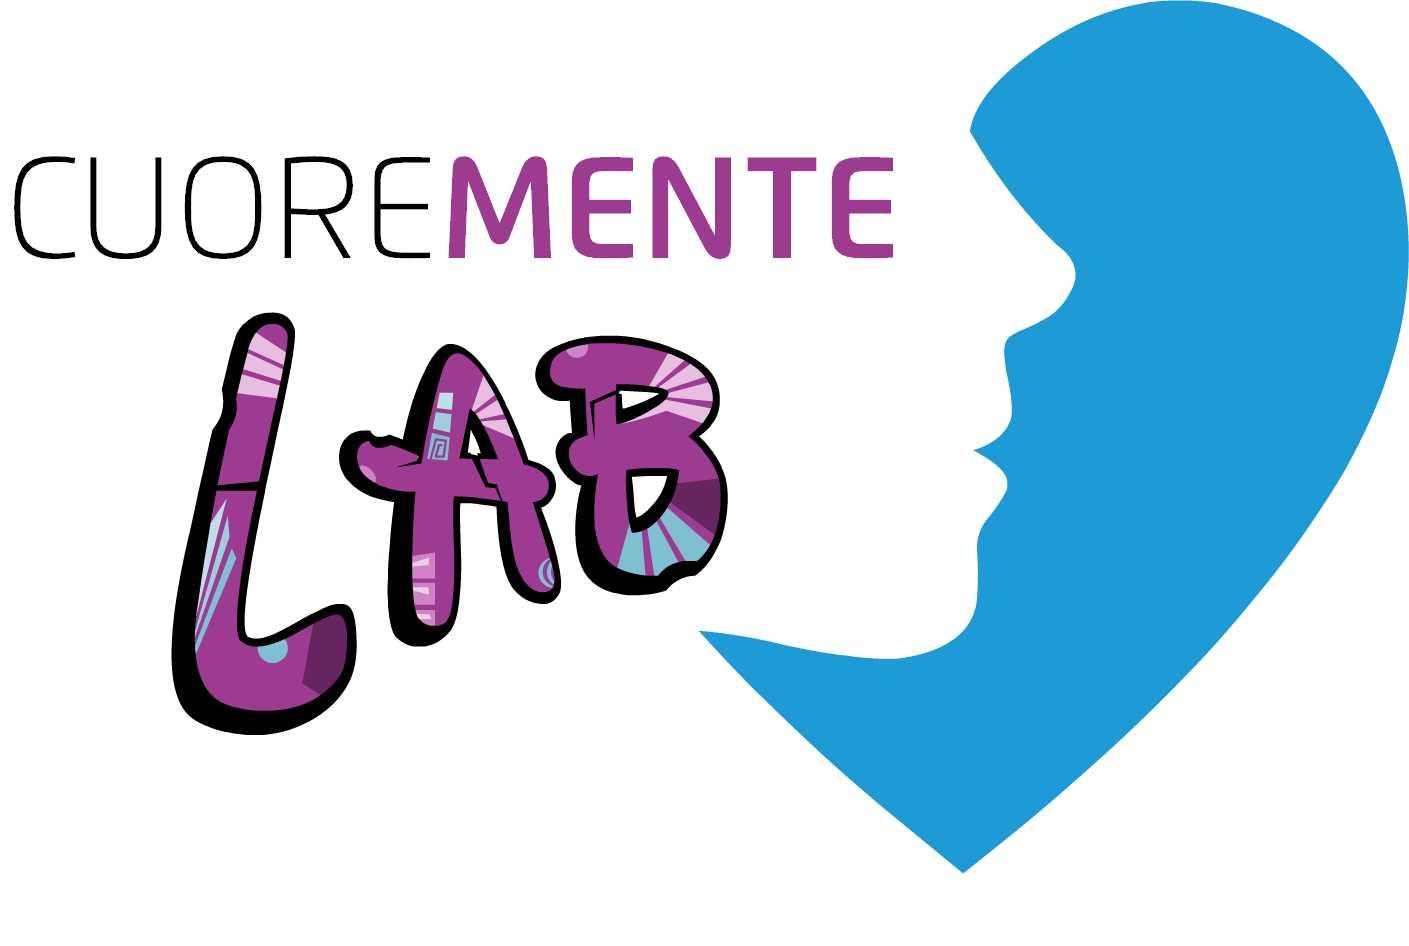 Cuoremente-Lab